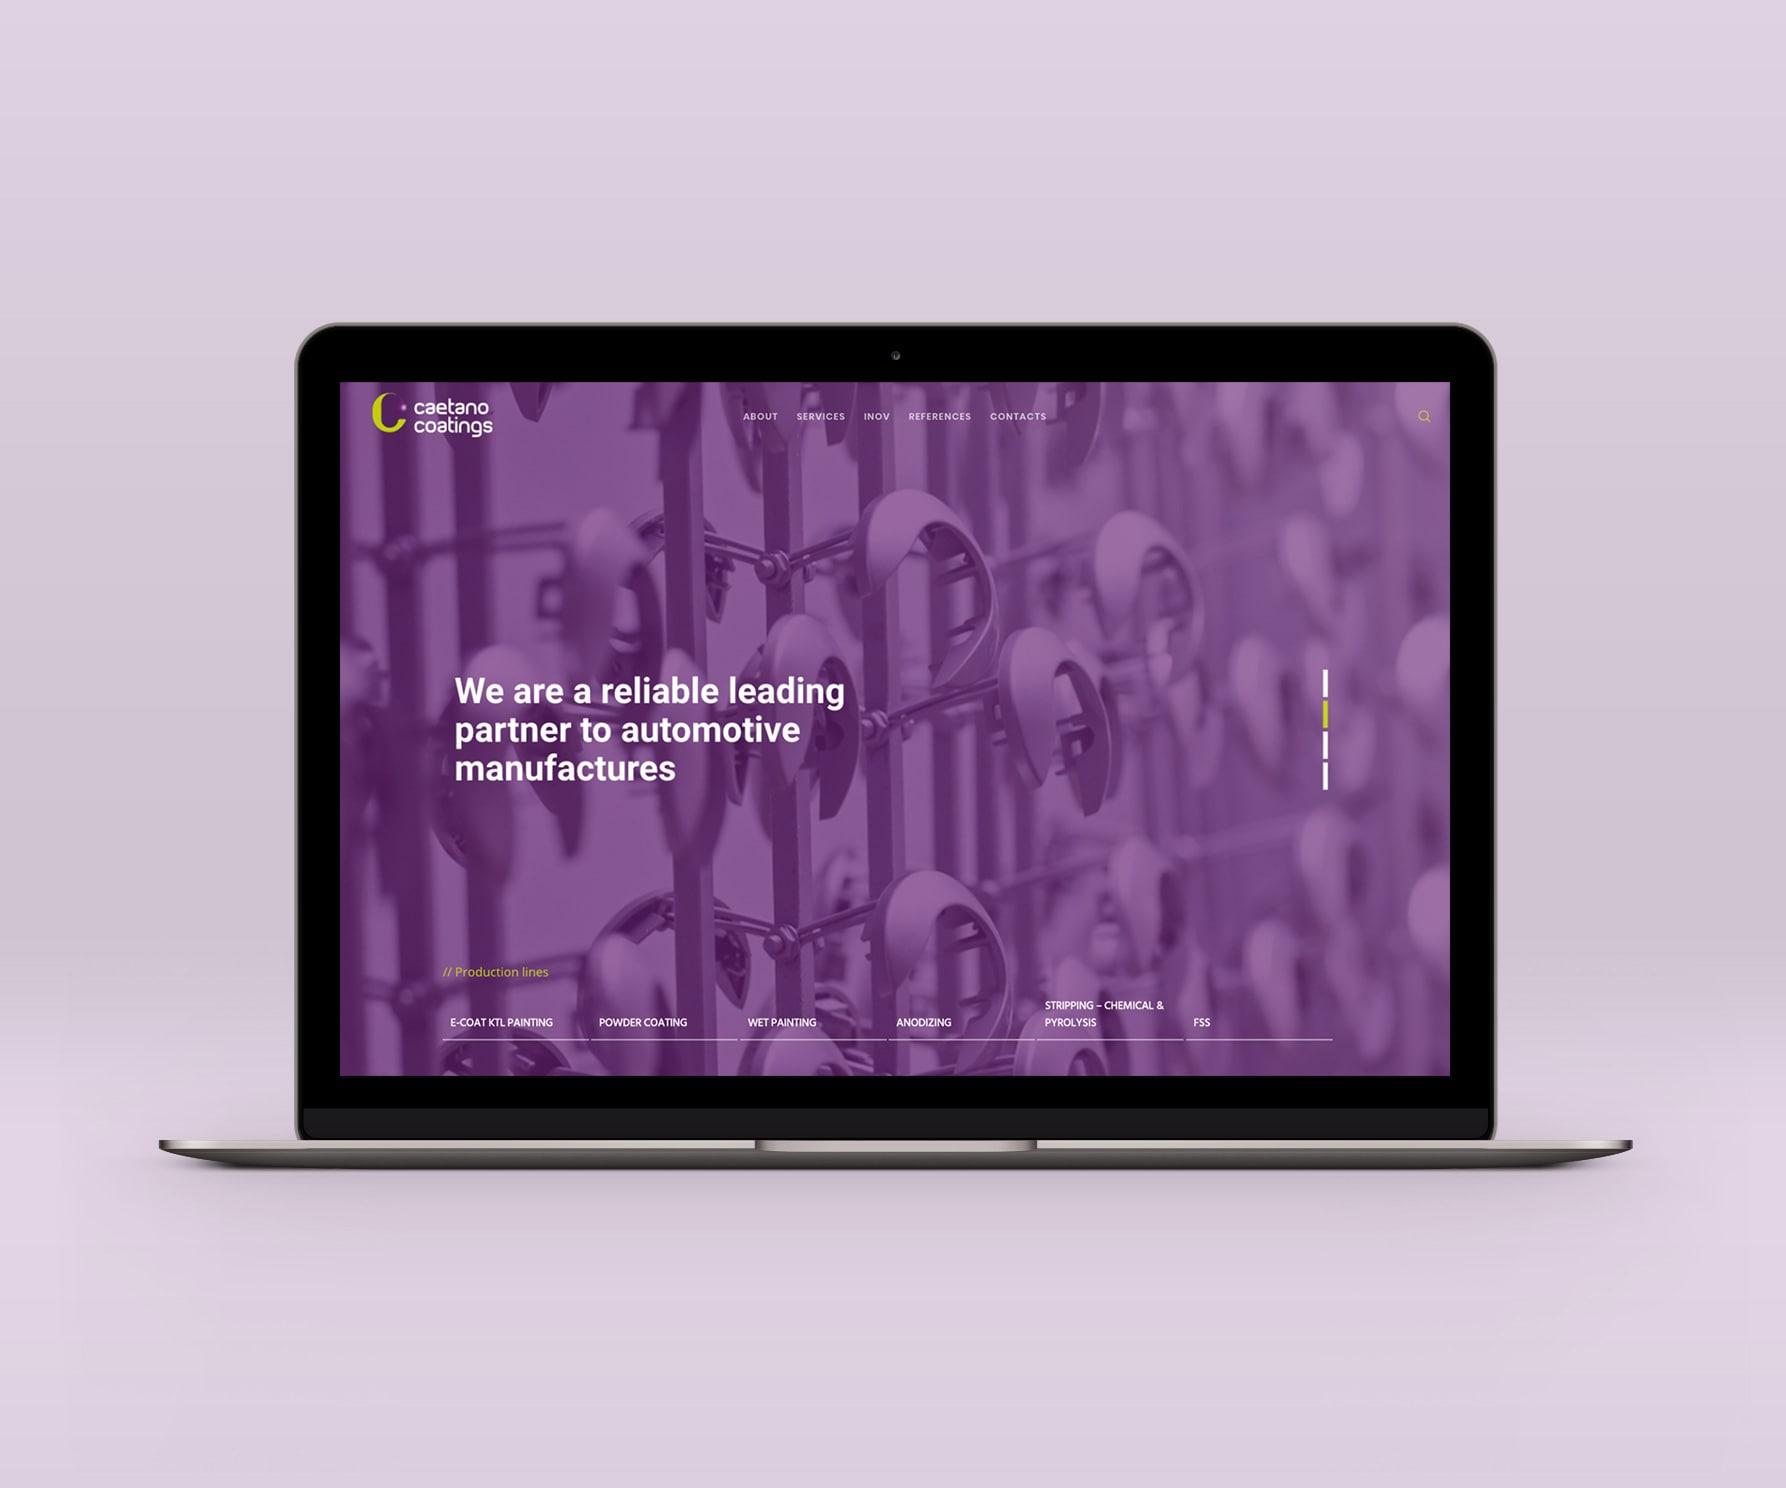 Web Design | Caetano Coatings